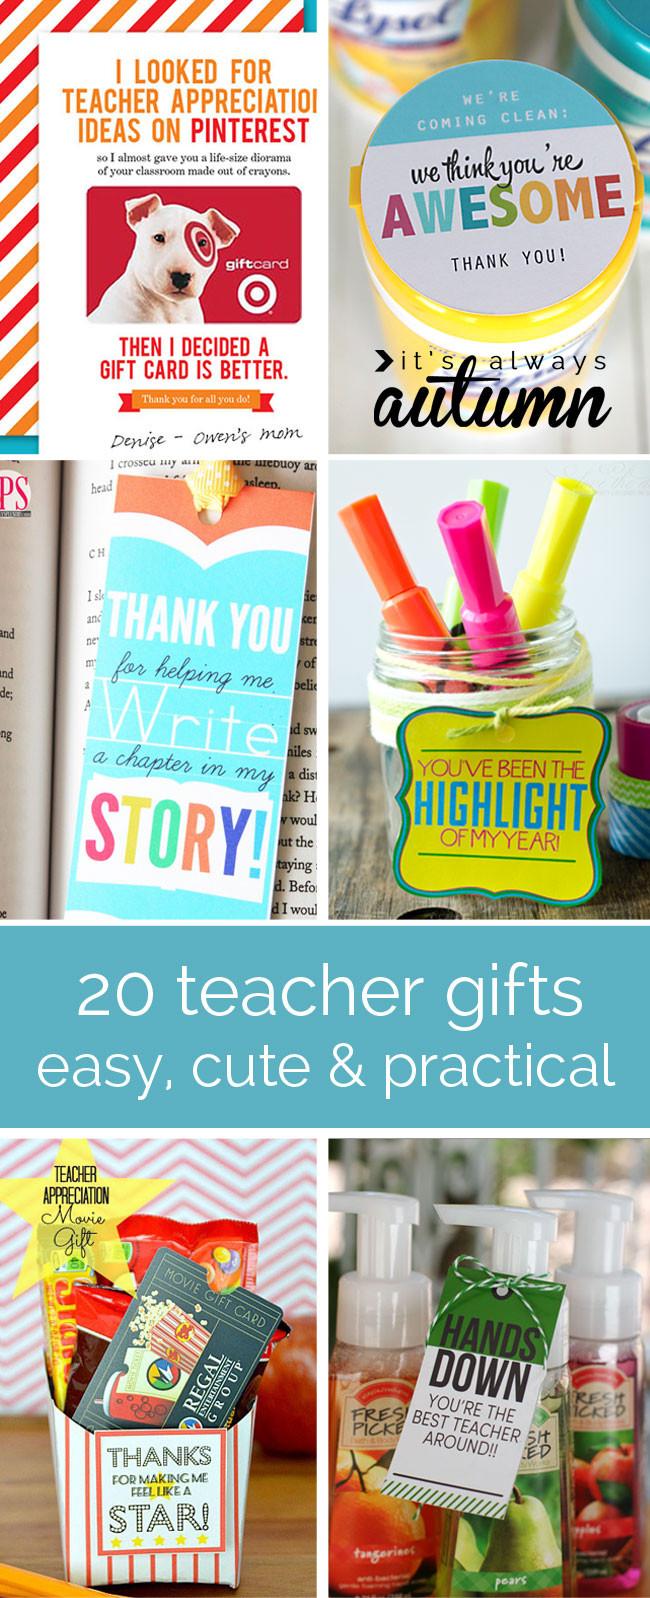 Best ideas about Teacher Appreciation Gift Ideas . Save or Pin 20 cheap easy cute & practical teacher appreciation Now.